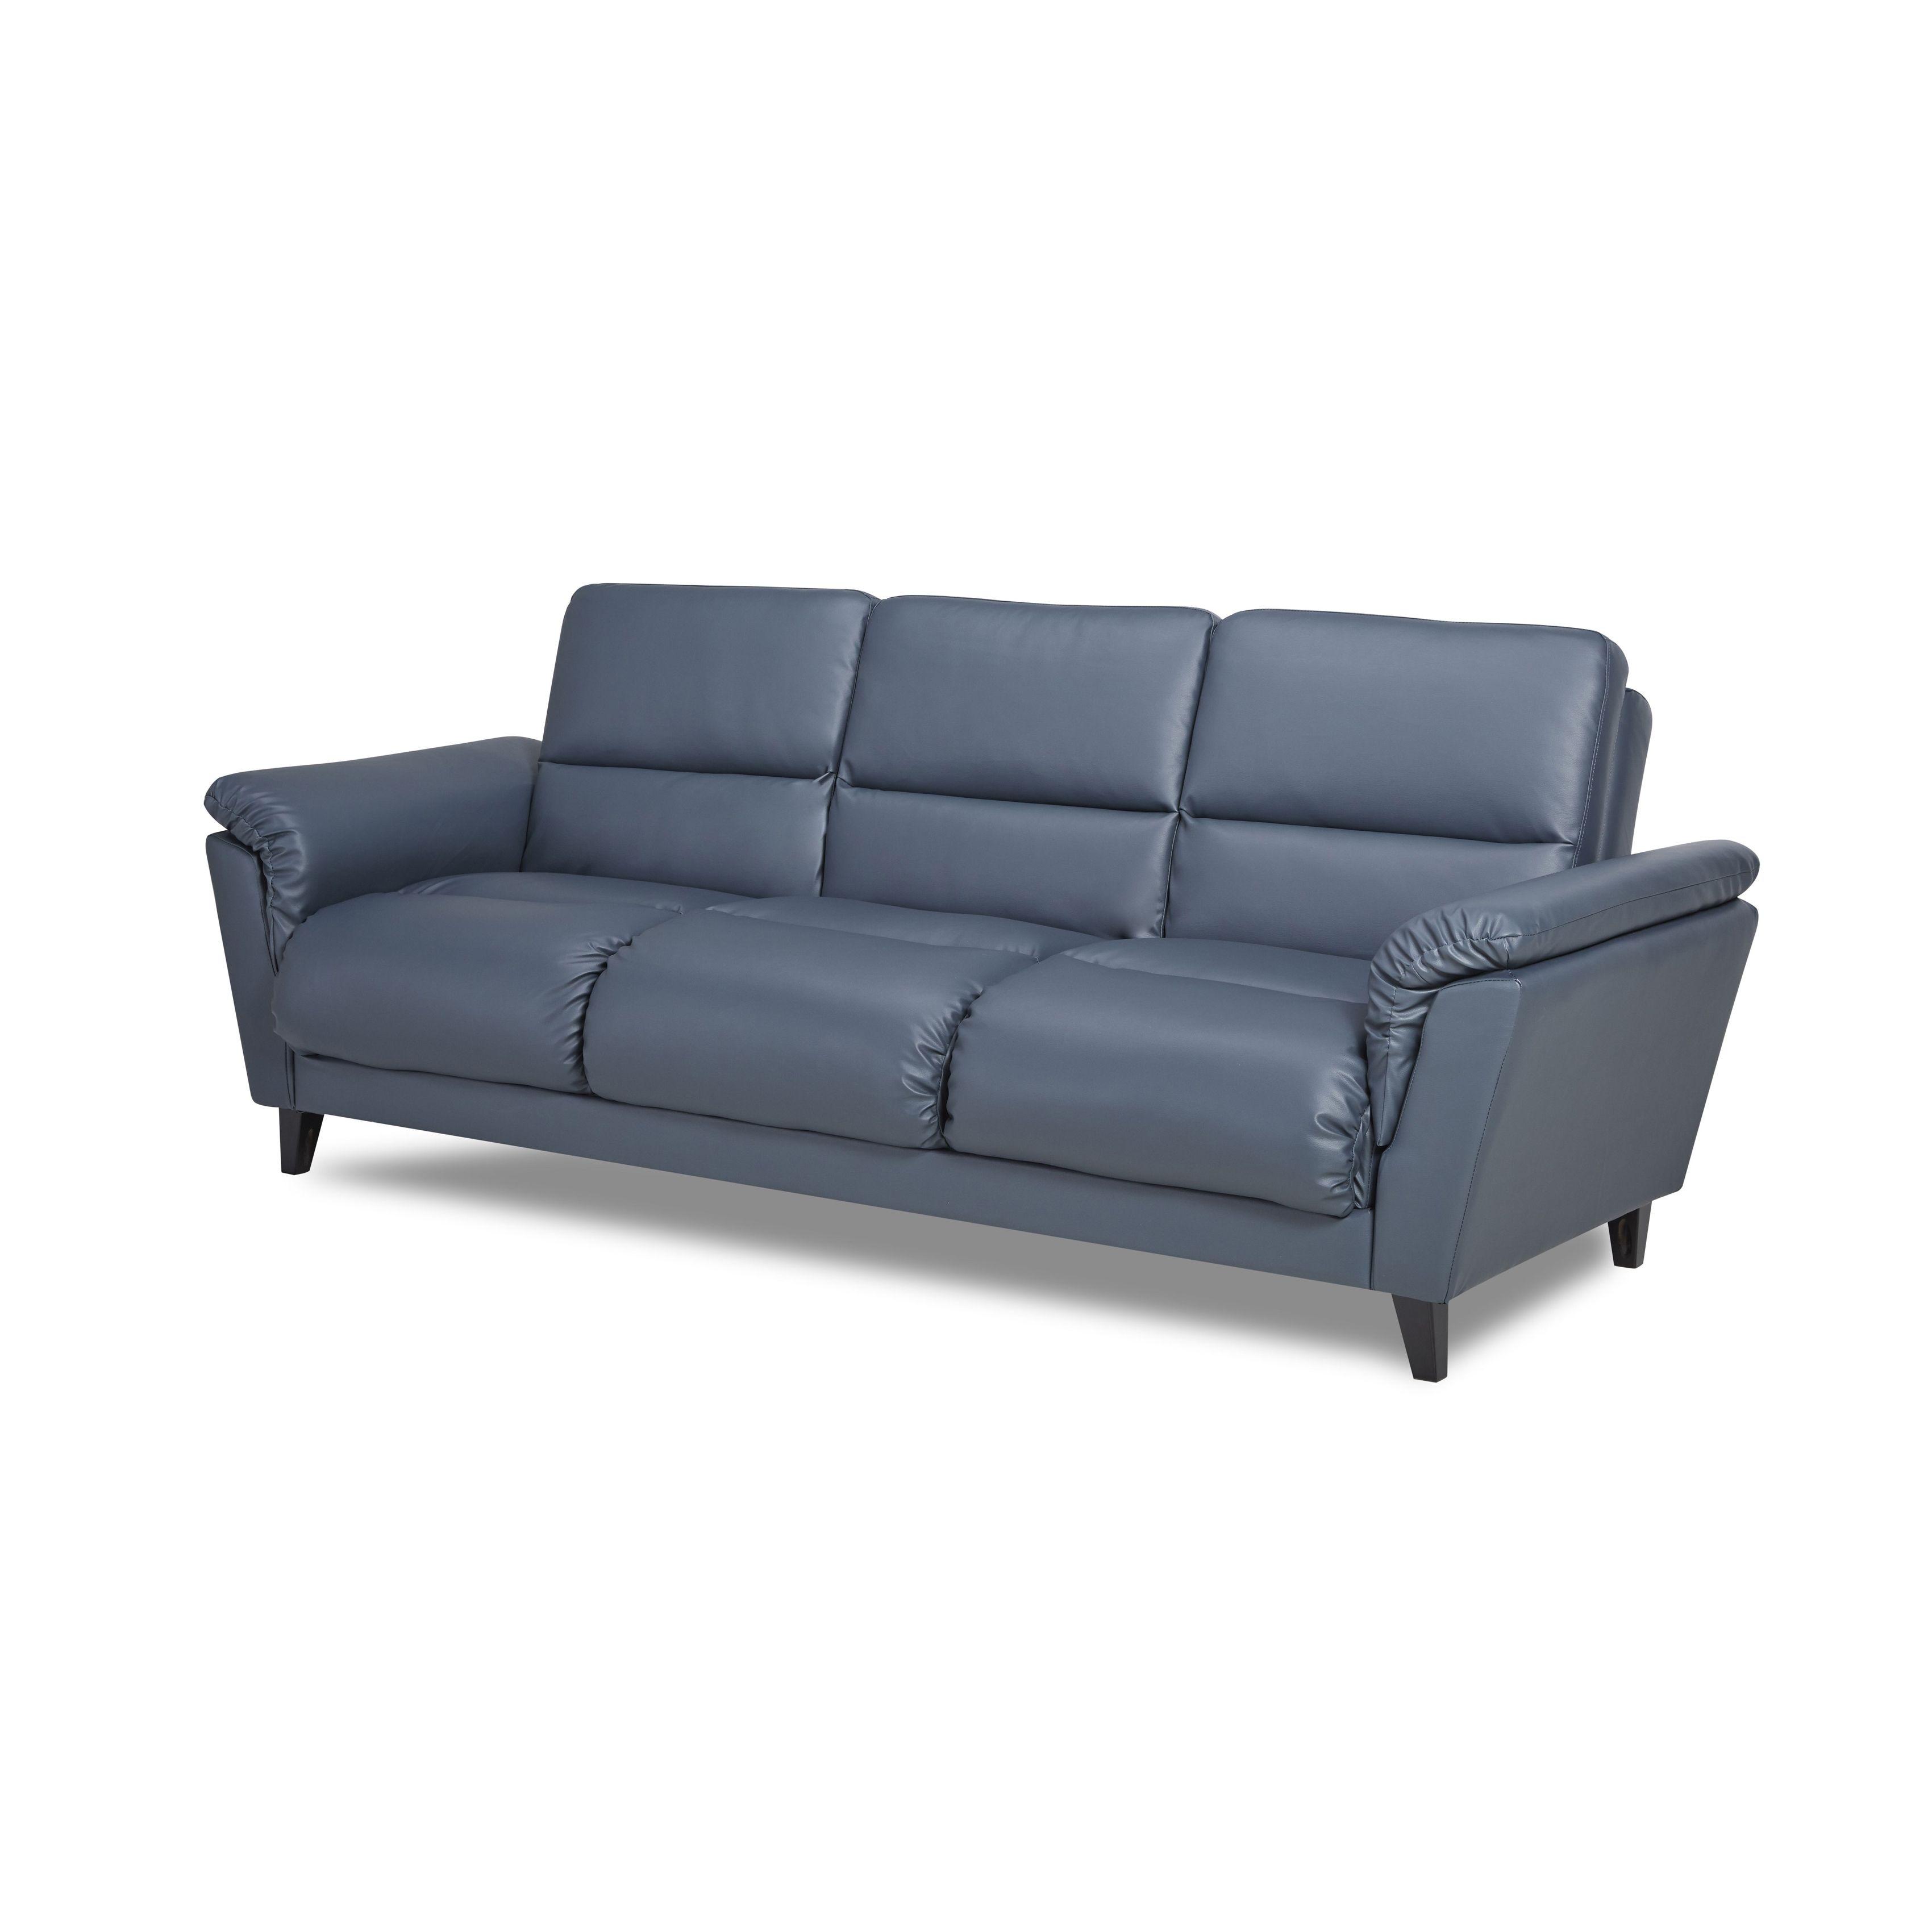 Gold Sparrow Richardson Smoke Convertible Sofa Bed